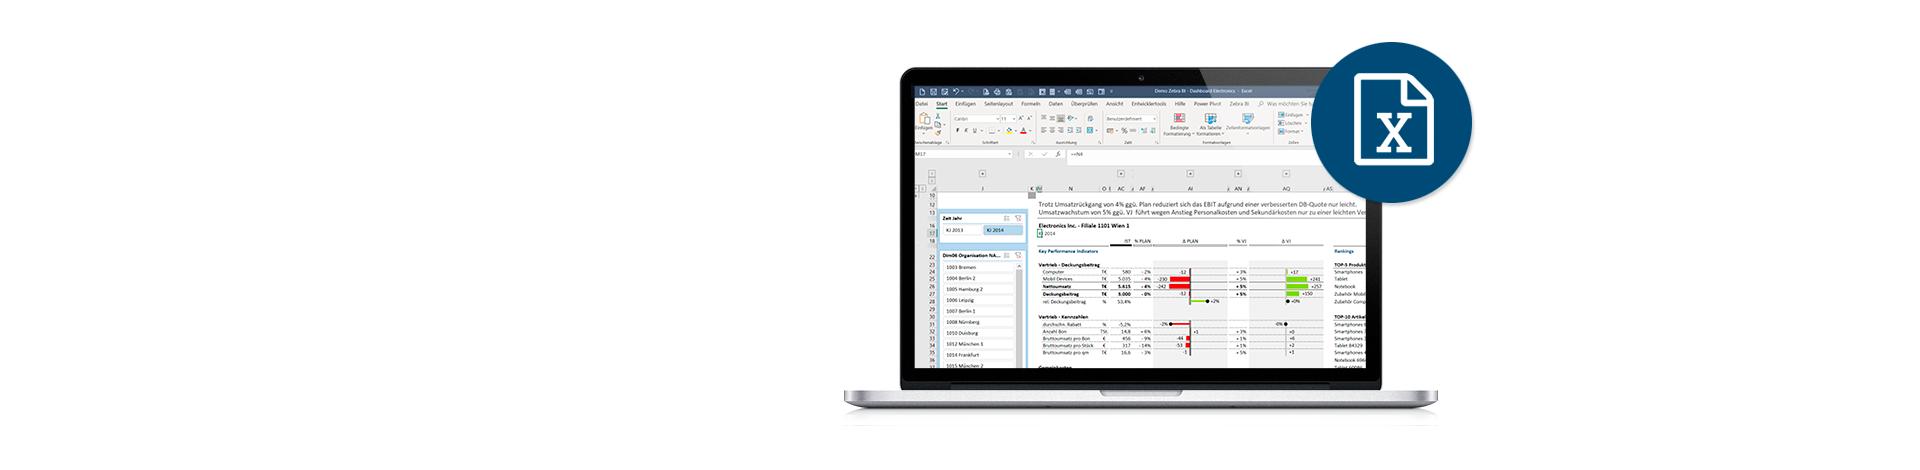 Excel Support erhalten